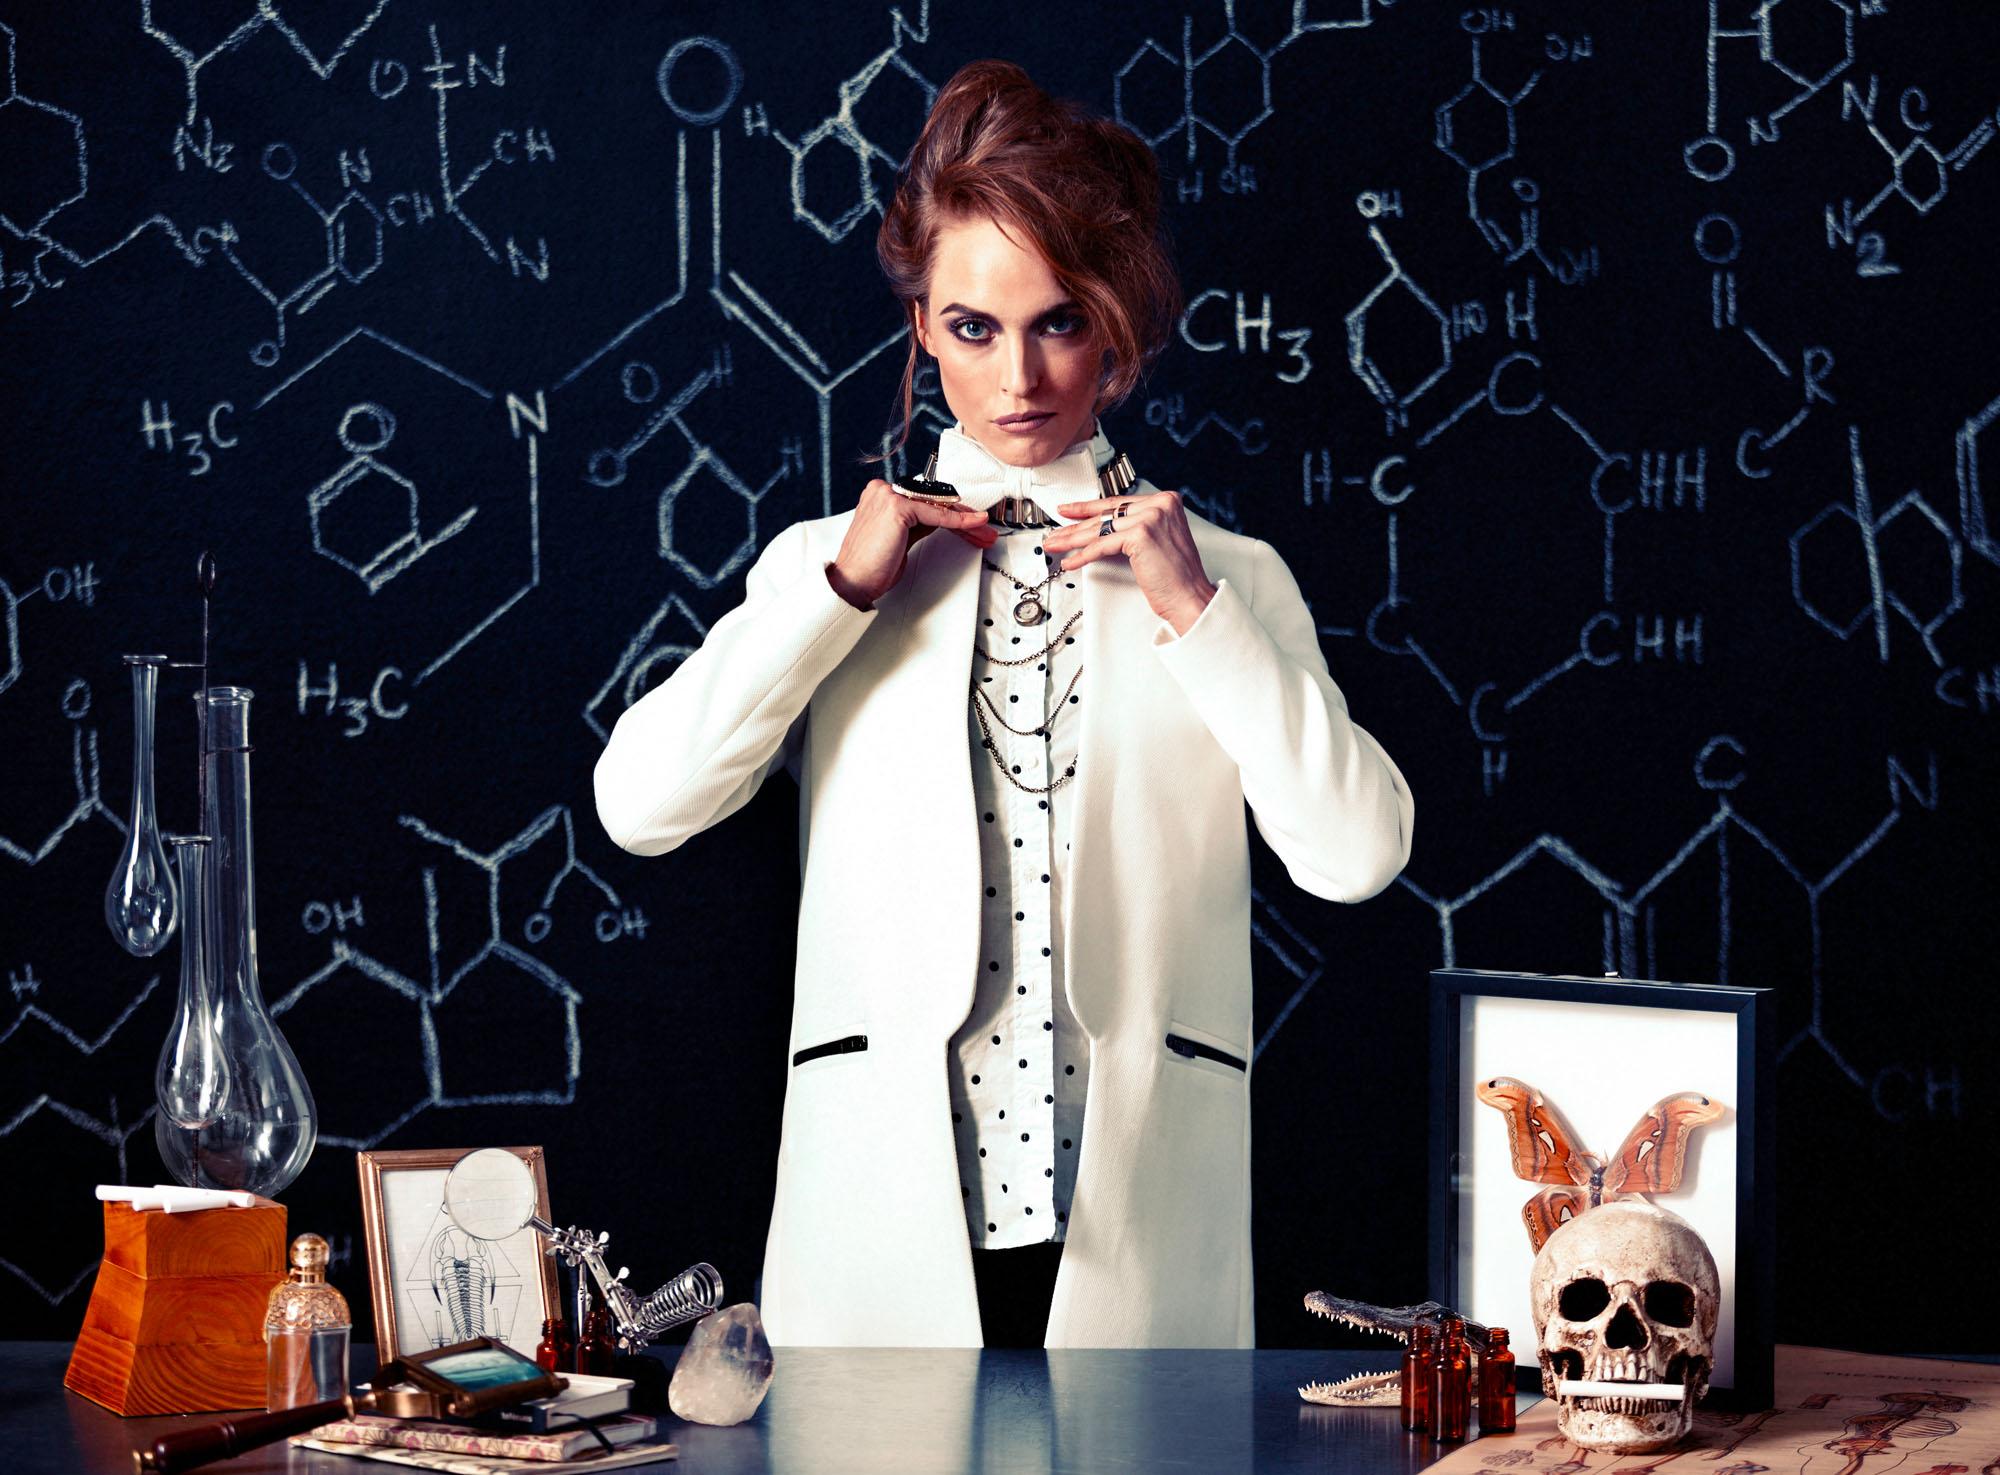 Mad Scientist 01